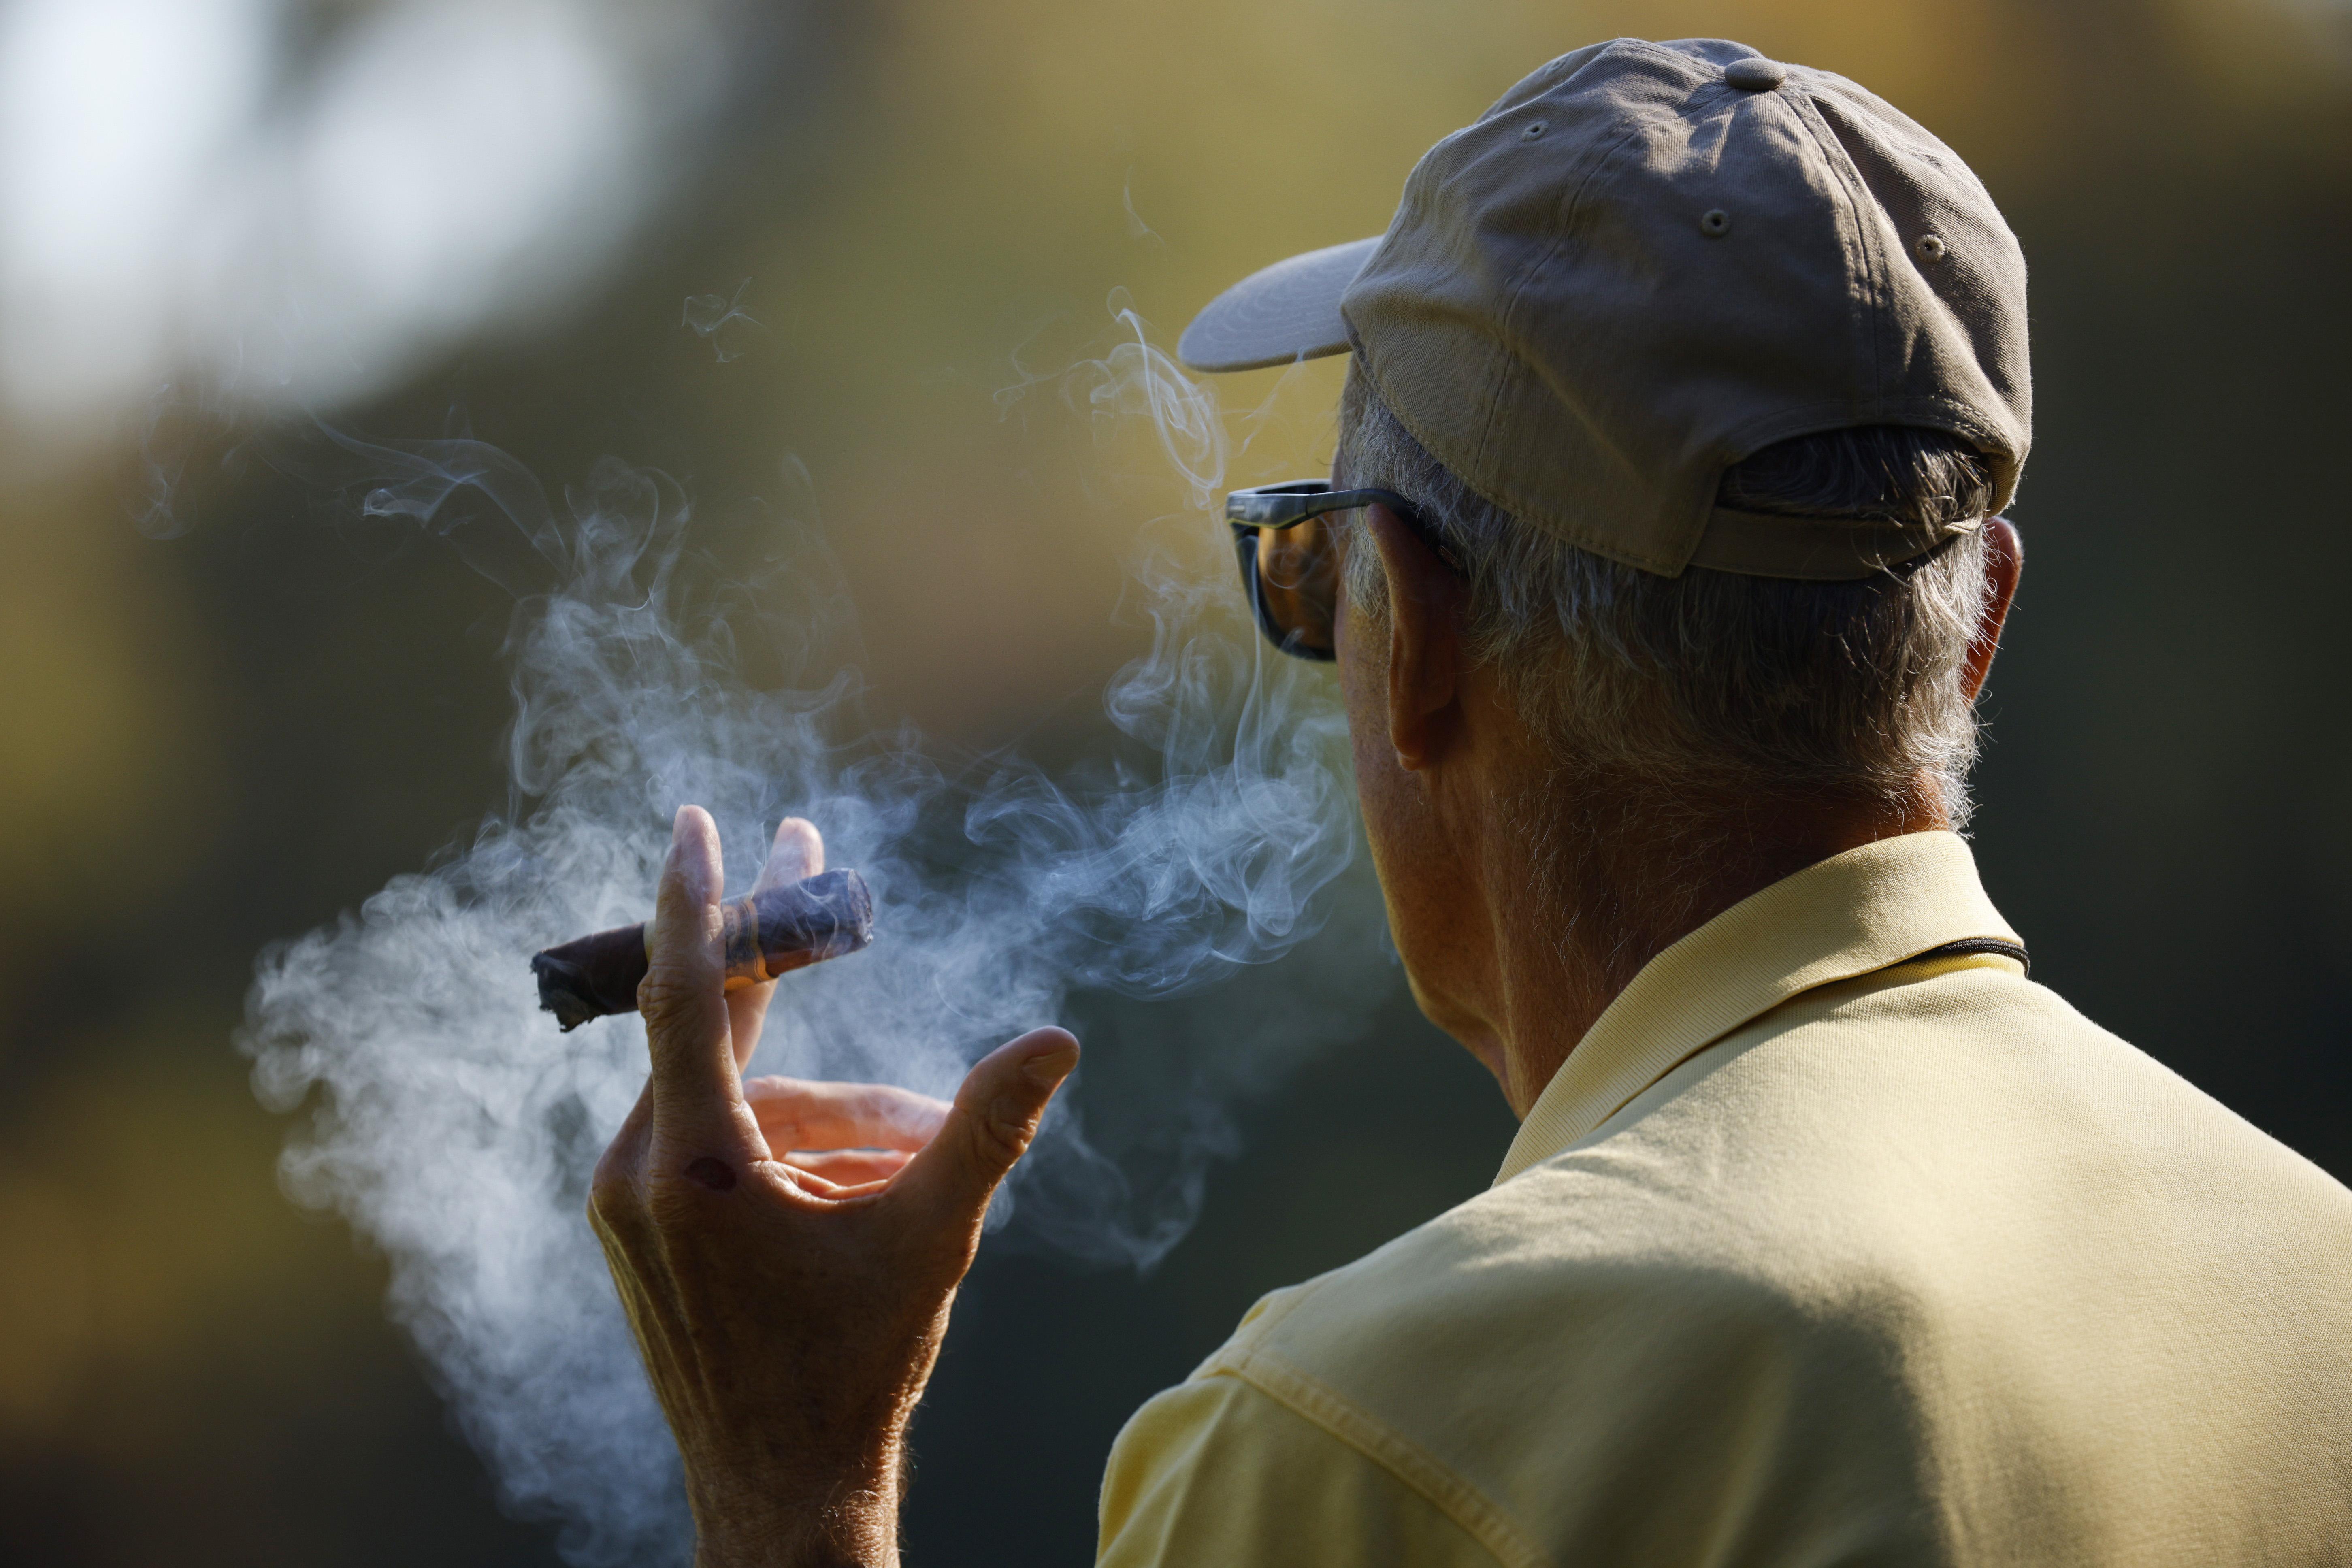 A spectator smokes a cigar in Augusta, Georgia, U.S., November 13, 2020. REUTERS/Brian Snyder